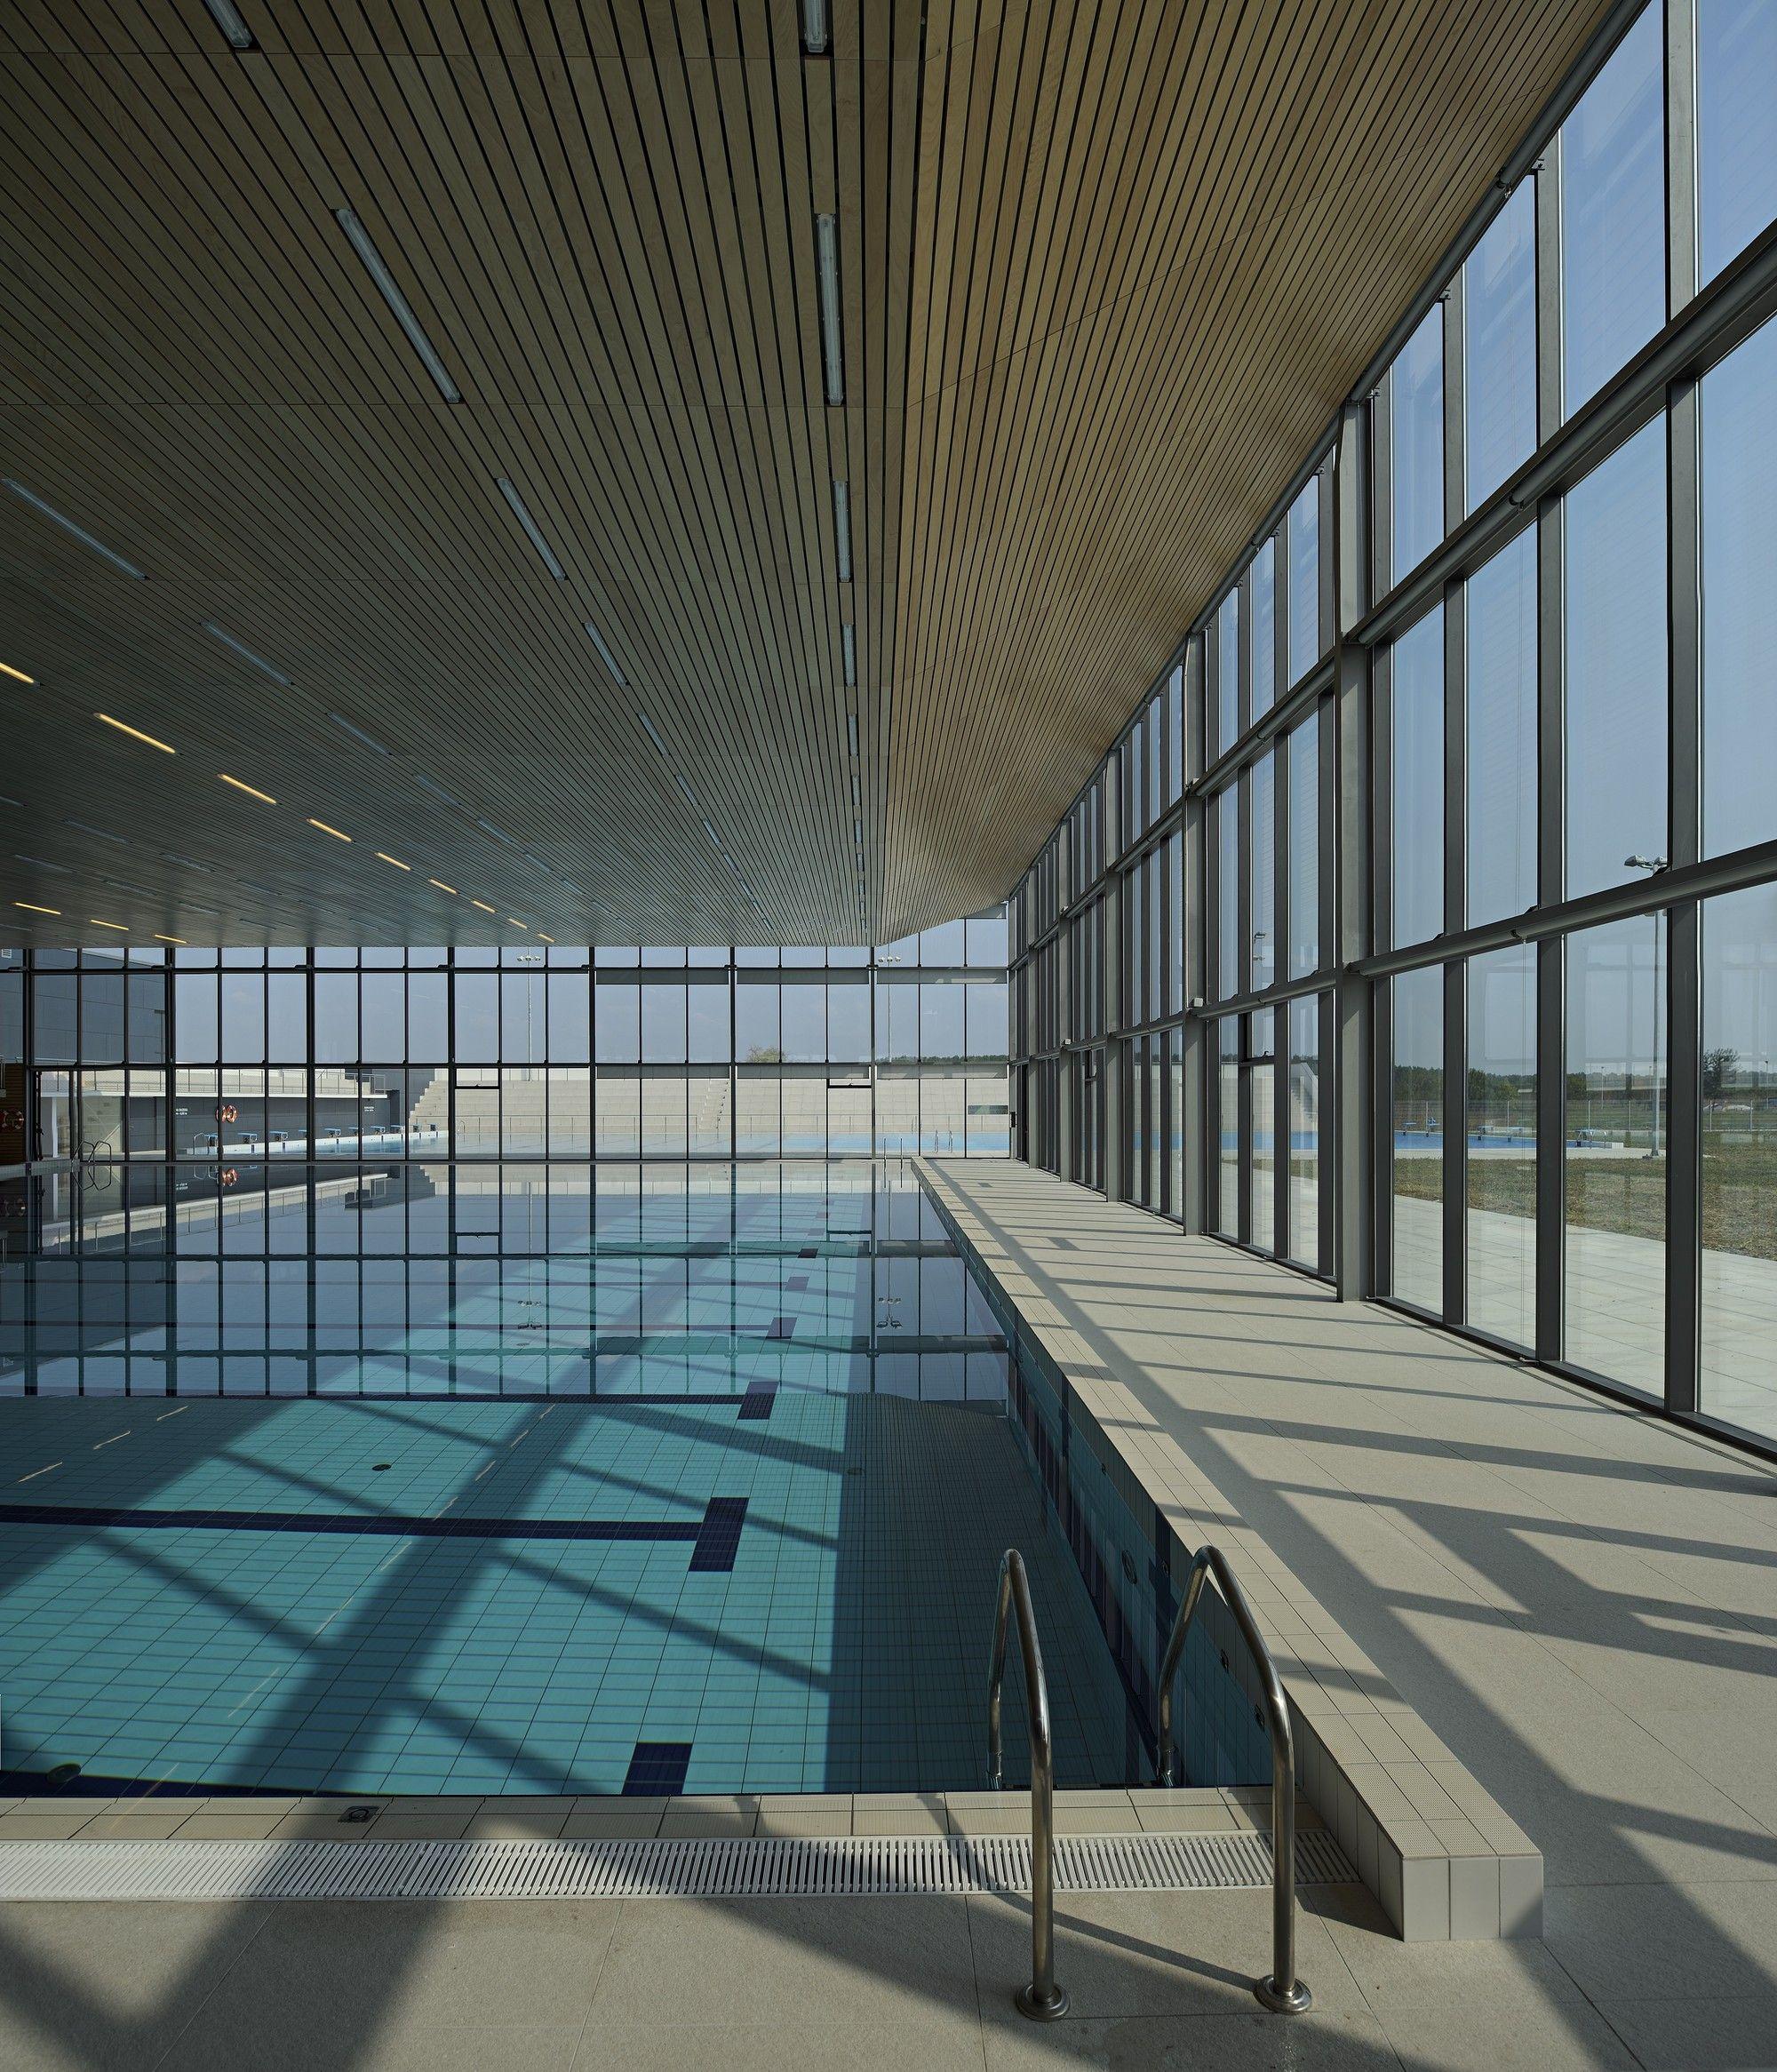 Gallery Of Swimming Center Vijus Sangrad Architects Avp Arhitekti 7 Swimming Pool Architecture Architecture Swimming Pools